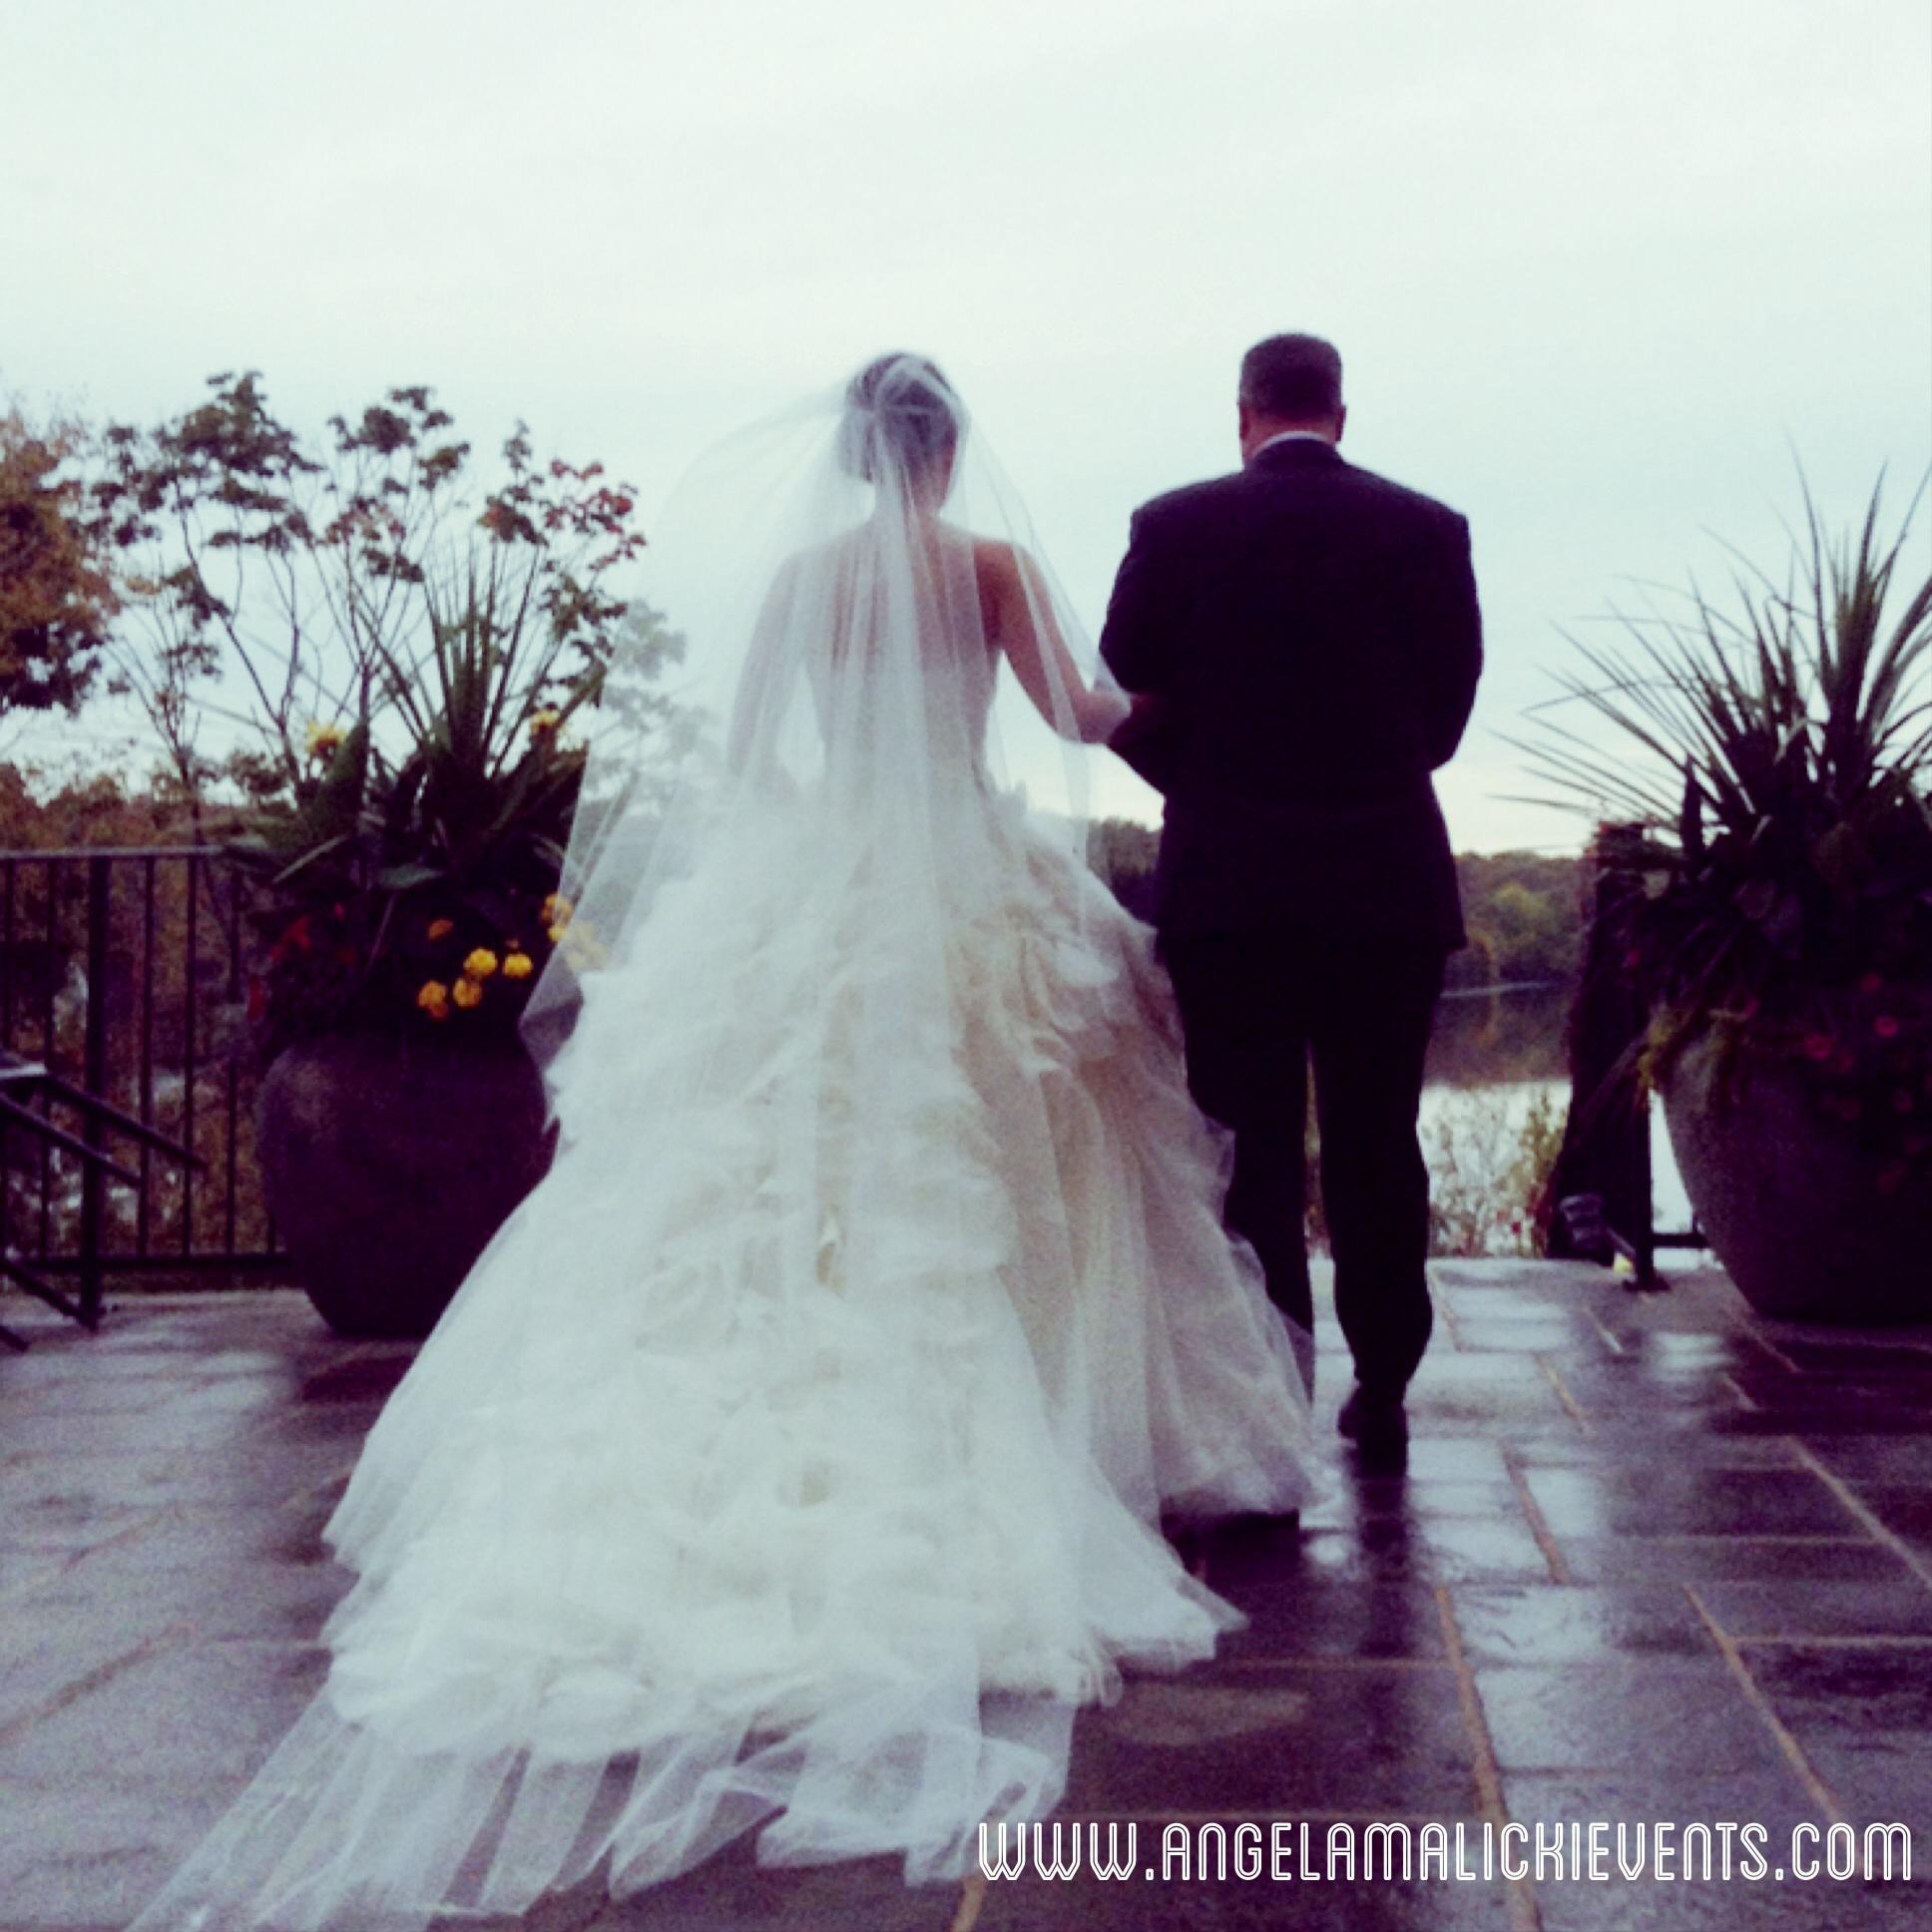 Philadelphia Wedding Planner, Angela MALICKI events, The Lakehouse Inn, Perkasie